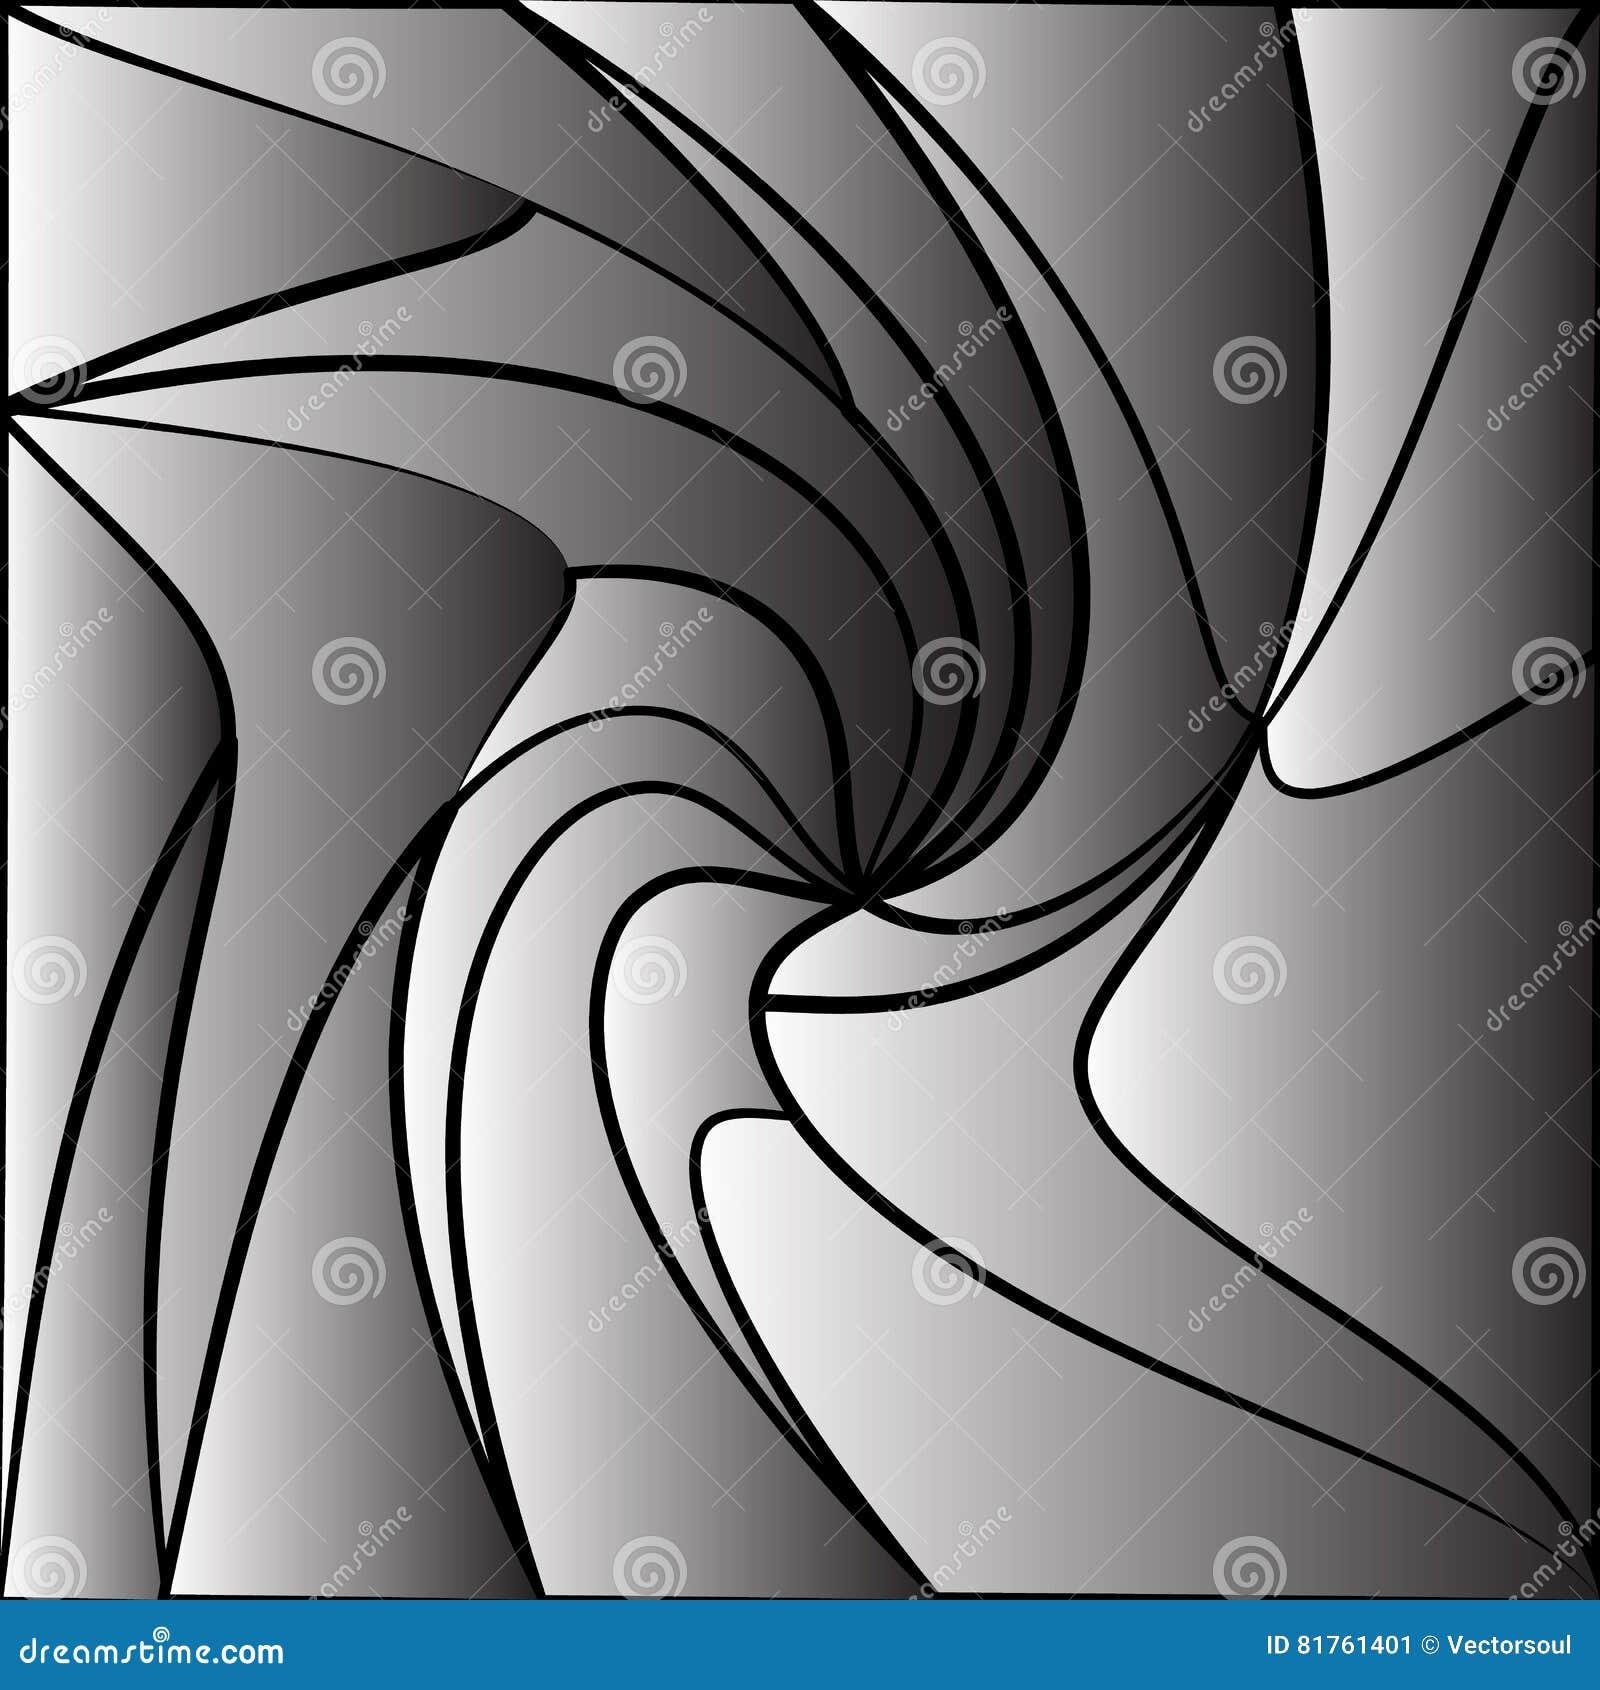 Monochrome tessellating предпосылка Картина передернутая конспектом